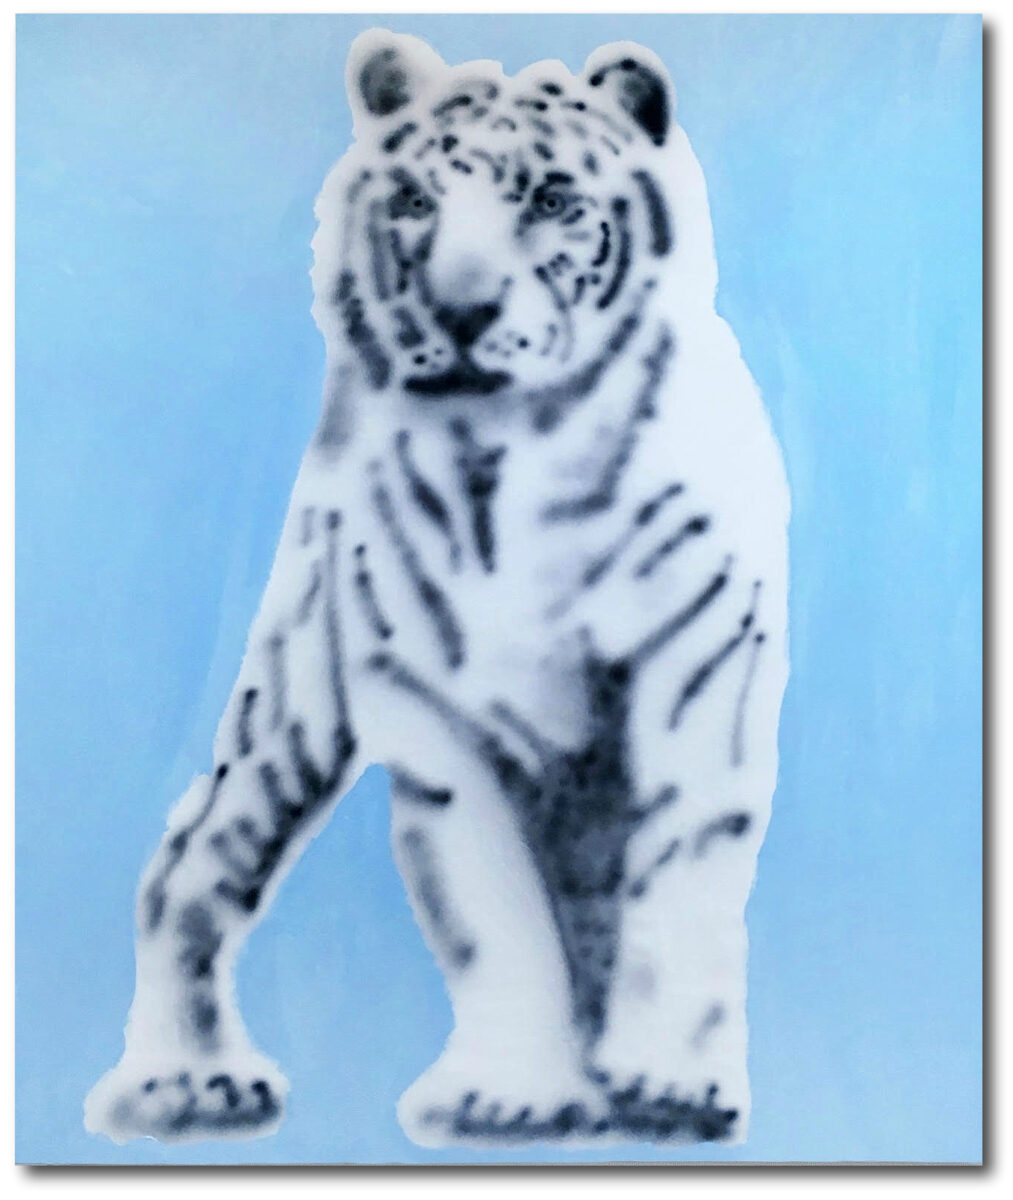 Tiger by Ricardo Passaporte